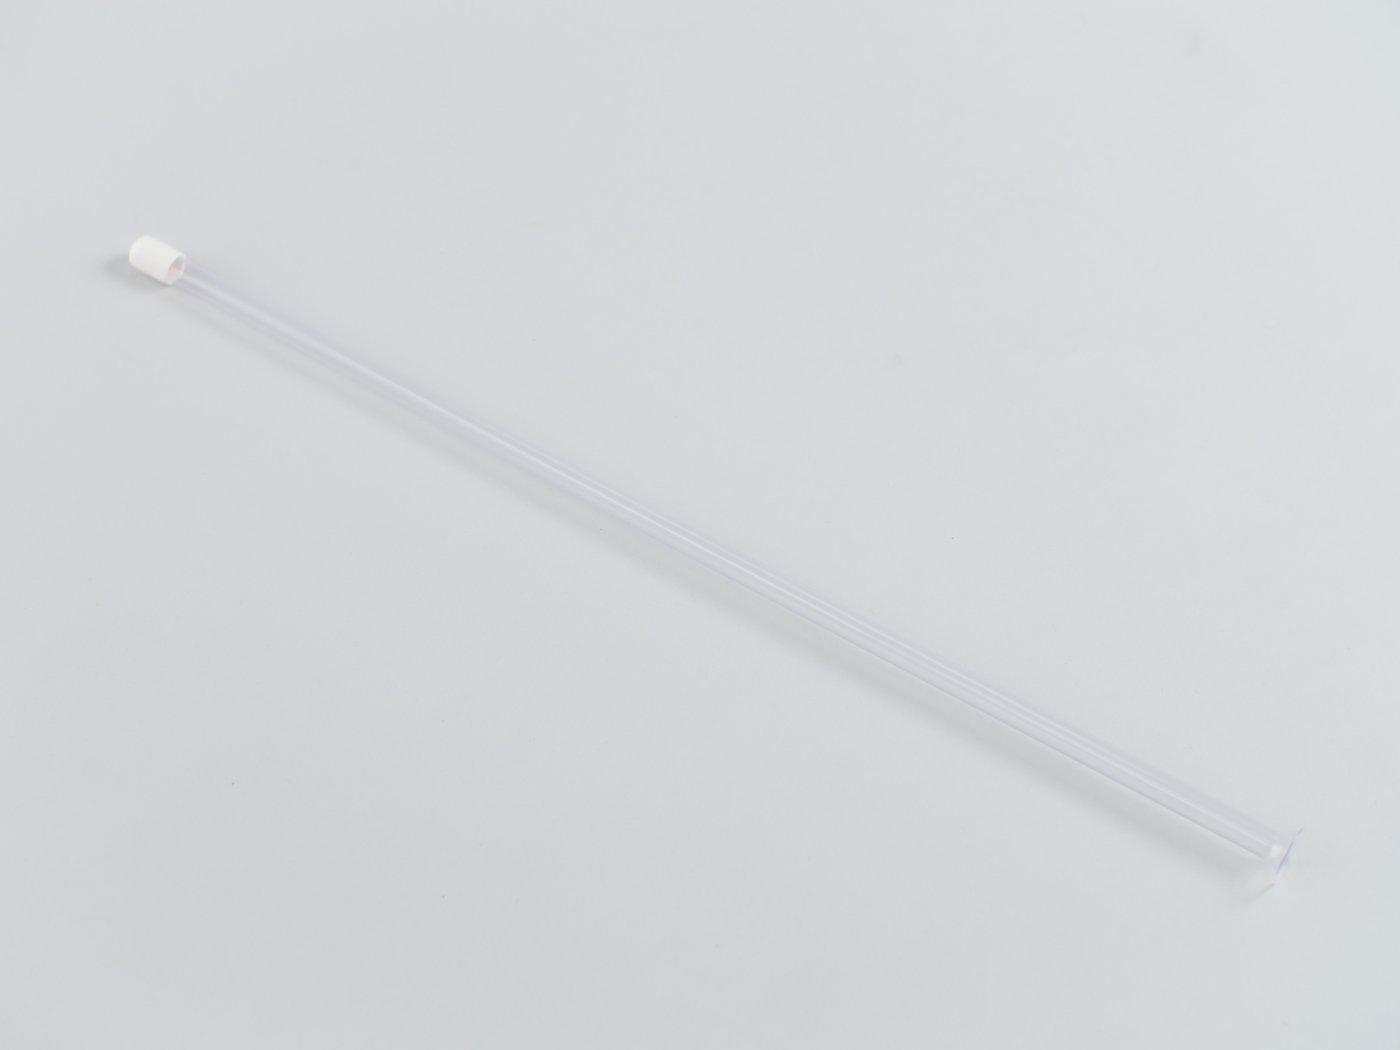 agtech sani shield rod protectors pro 25st